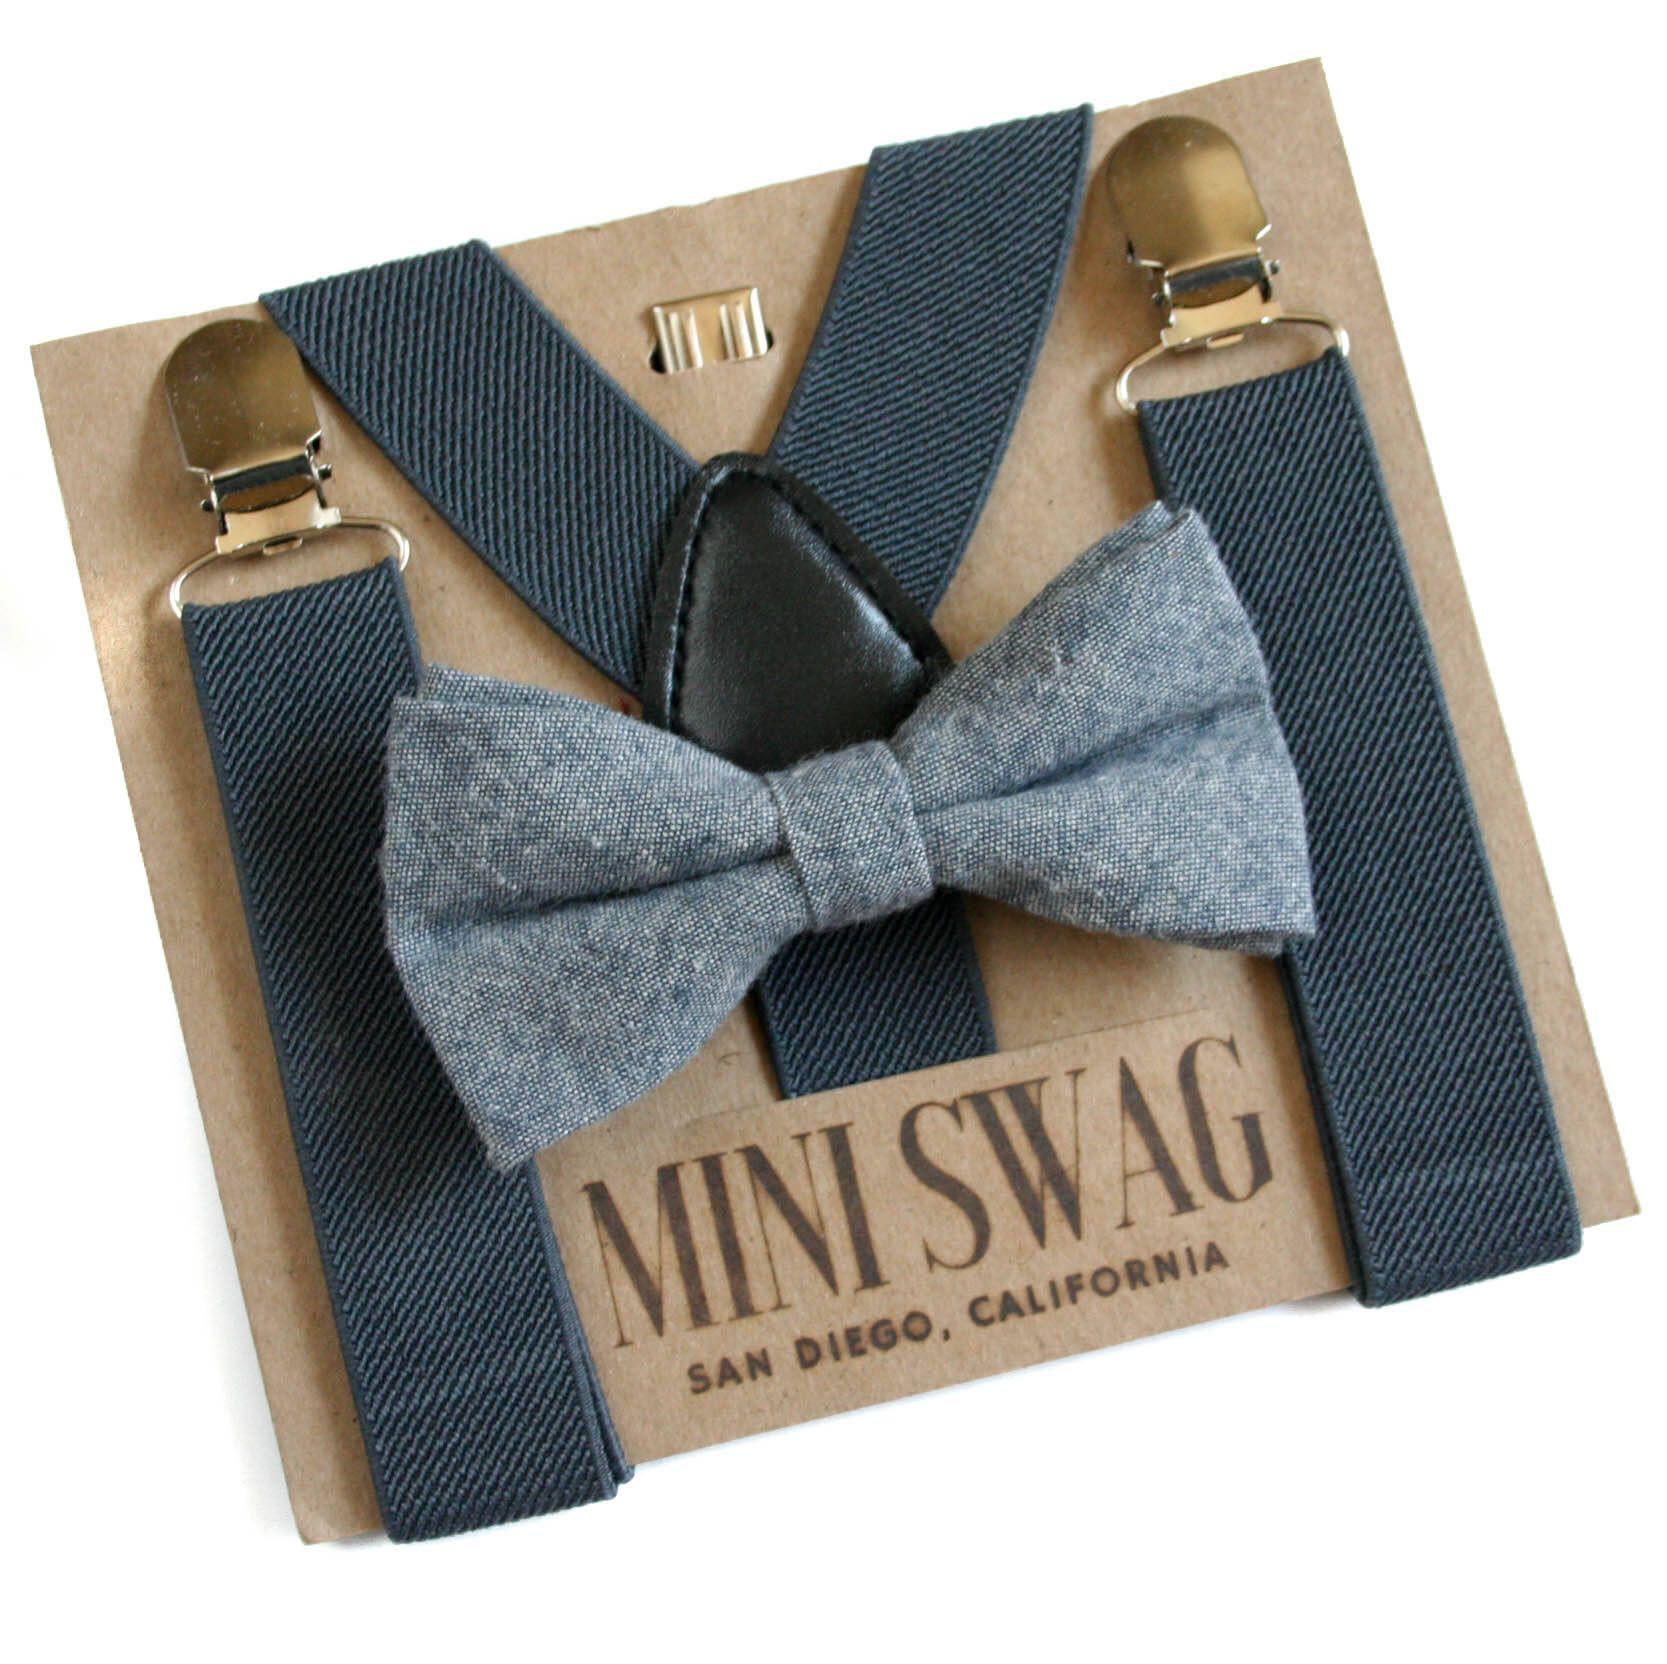 f336fb331f76 Dark Gray Suspenders and Gray Boys Bow Tie, Baby Boy 1st Birthday Outfit,  Mini Swag Textiles, Gray Baby Suspenders, Toddler Bow Tie Set, Boy Cake  Smash ...